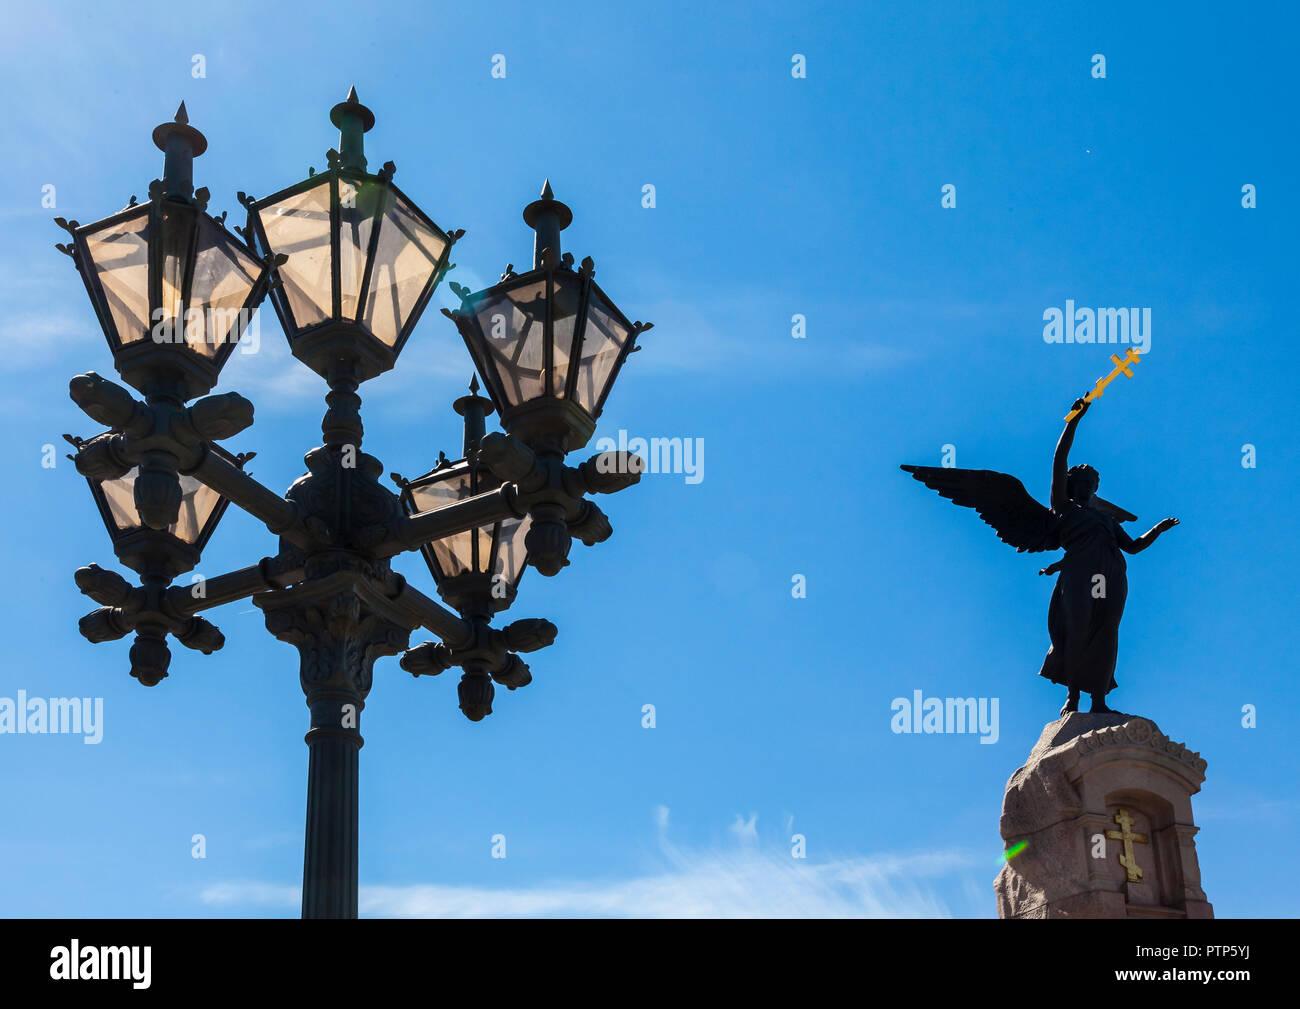 Spectacular lights beside Russalka Memorial in Tallinn commemorating the sinking of Russian warship Rusalka in 1893 - Stock Image